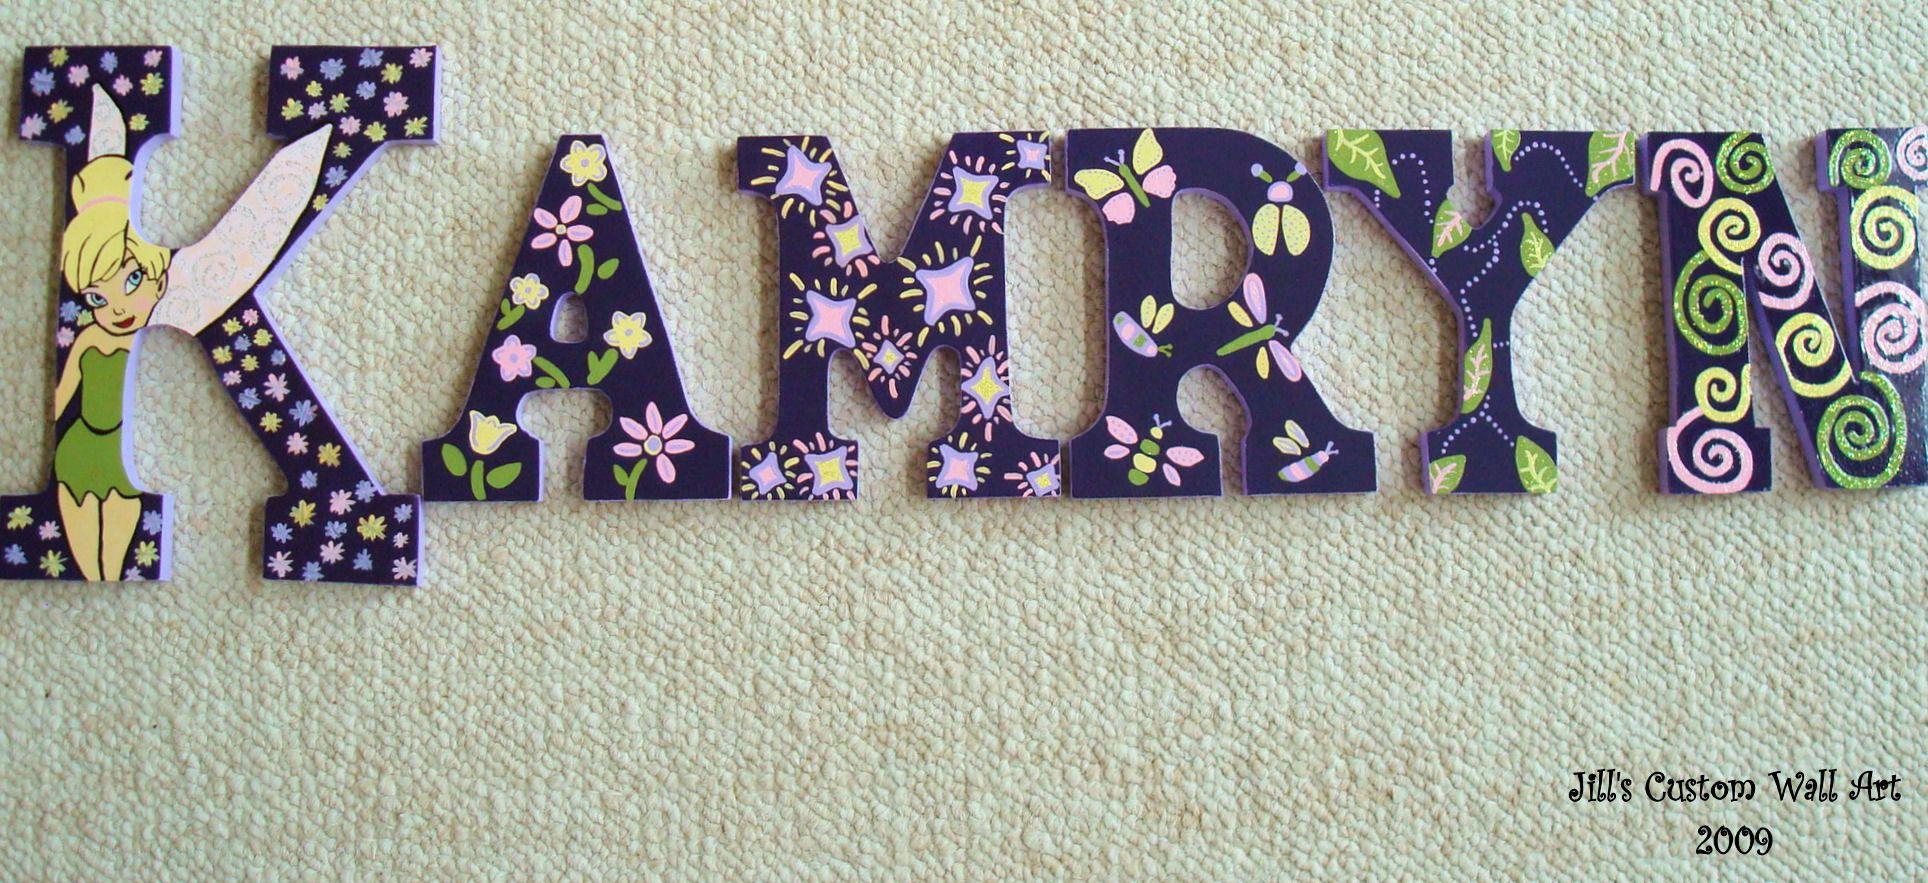 Super cute Kamryn wood letters!   Custom wall art, Kamryn